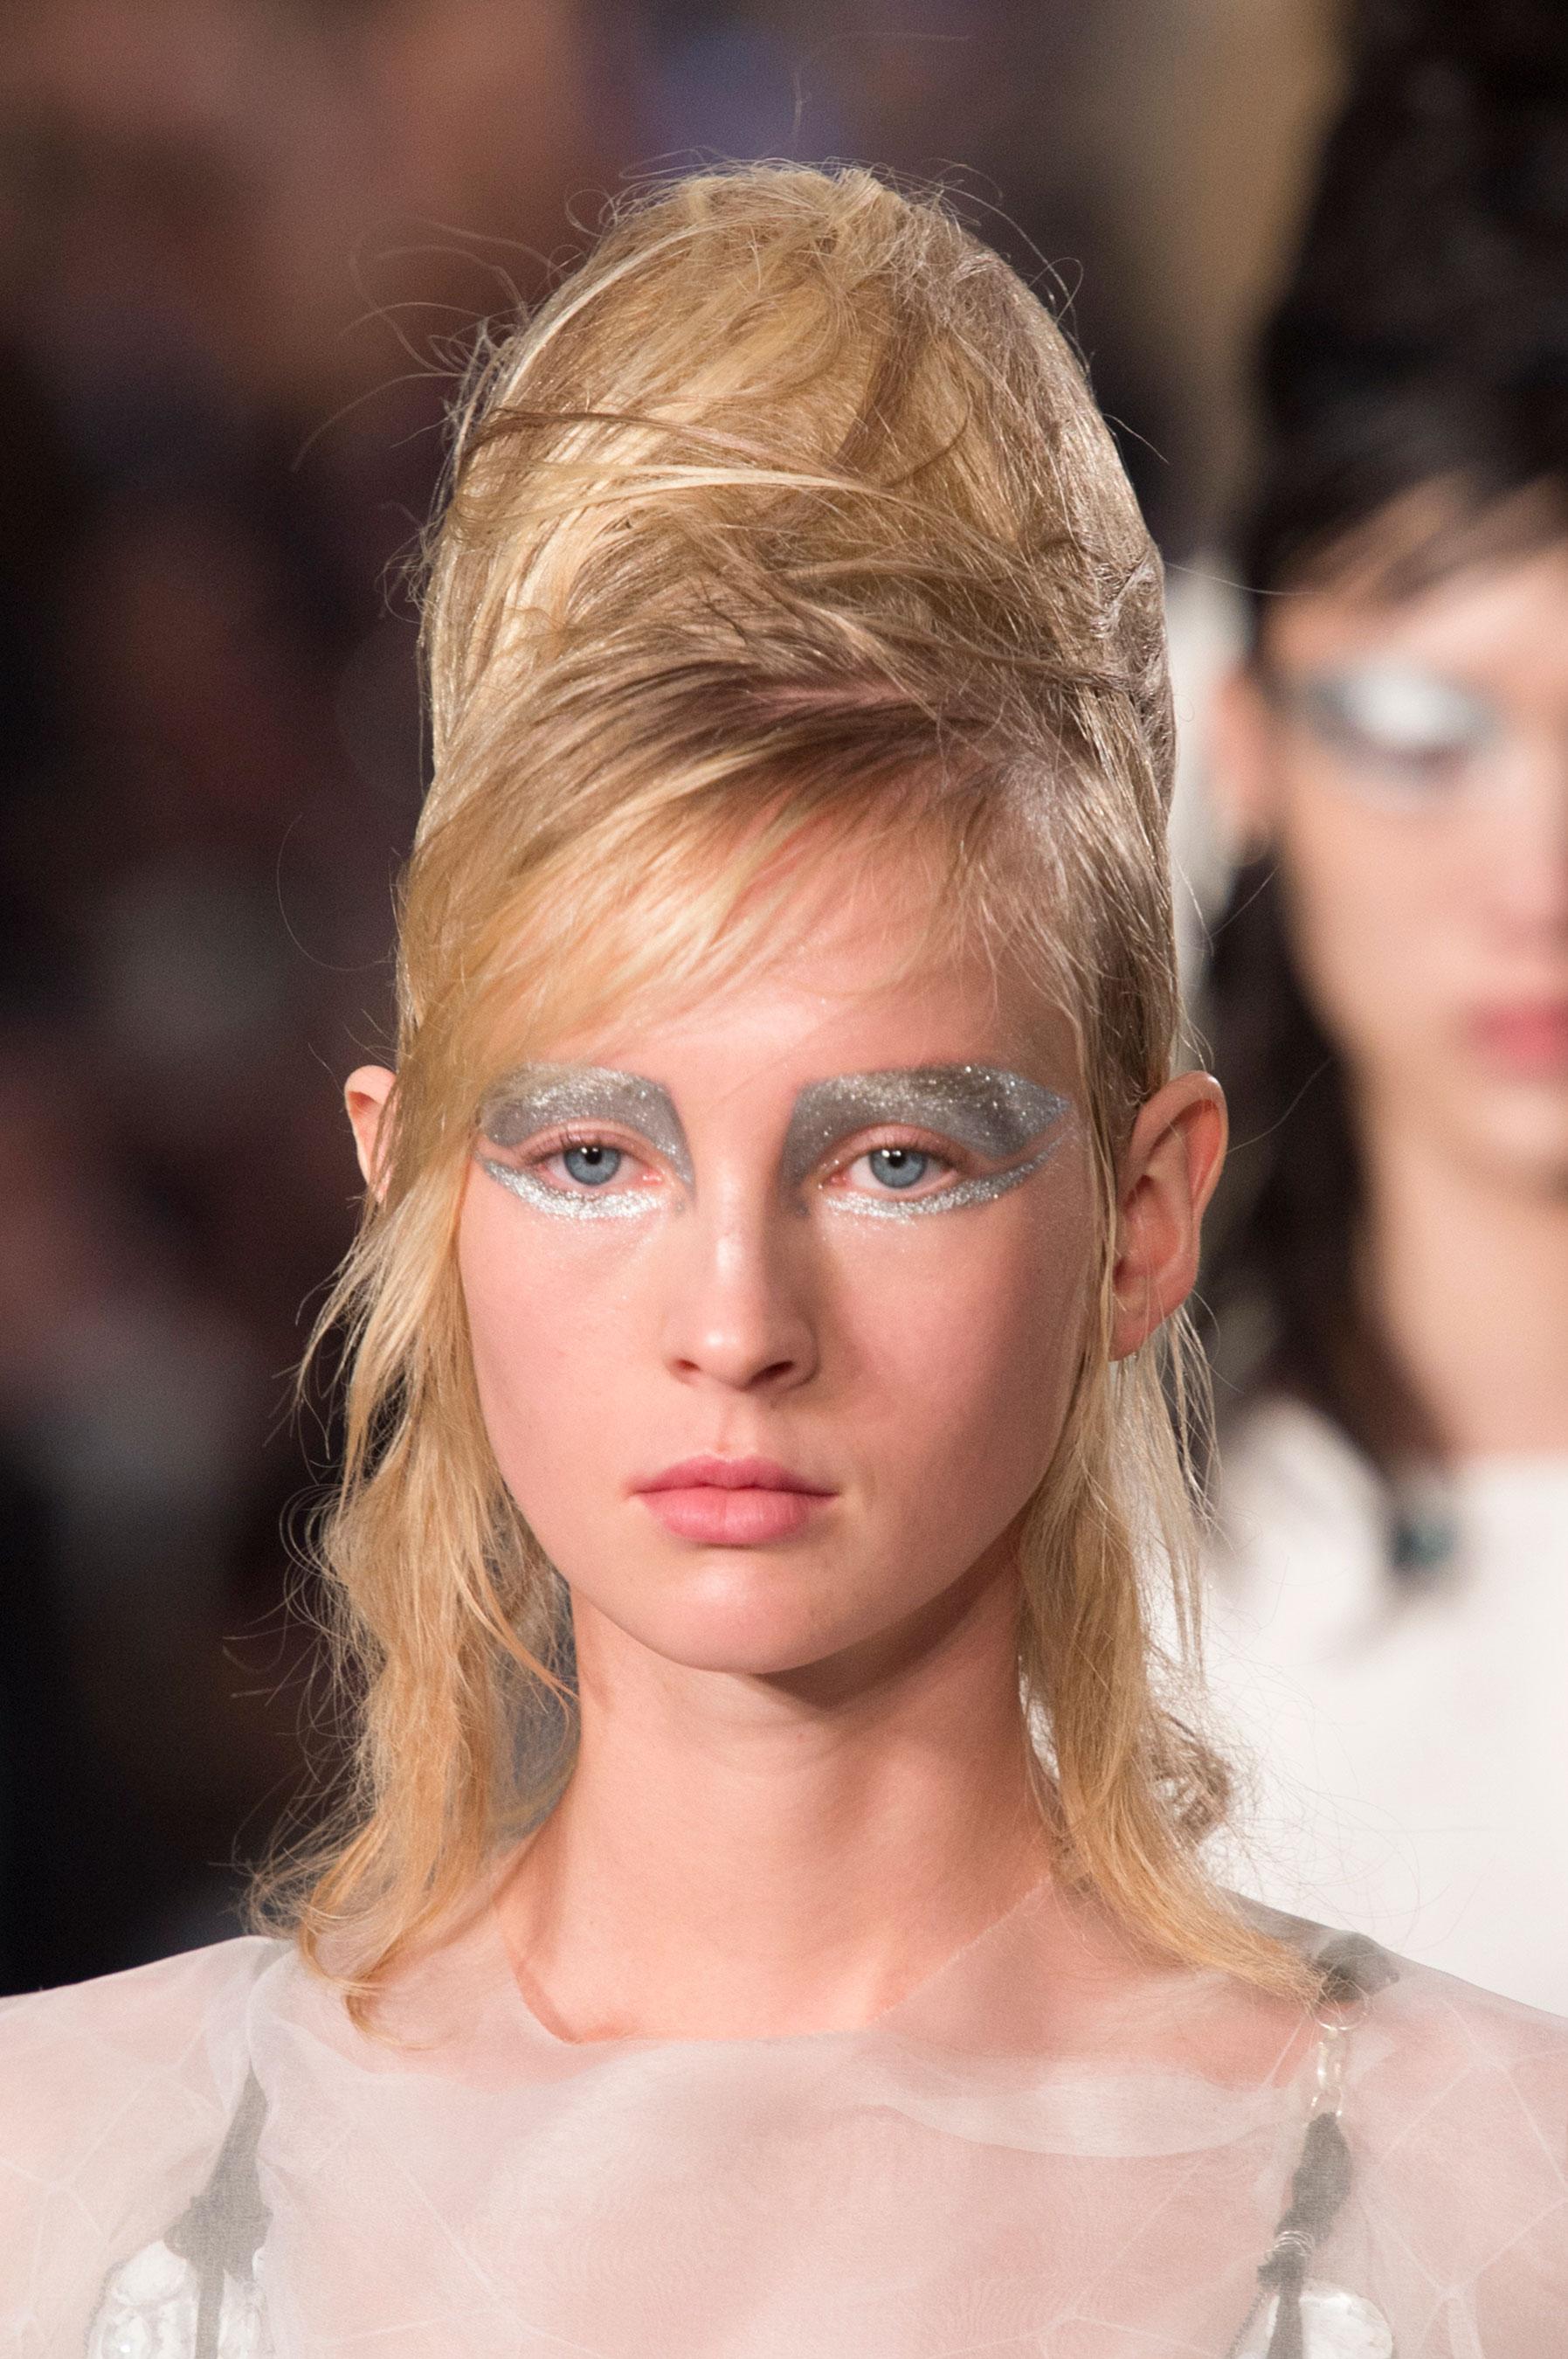 Maison-Margiela-spring-2016-runway-beauty-fashion-show-the-impression-058